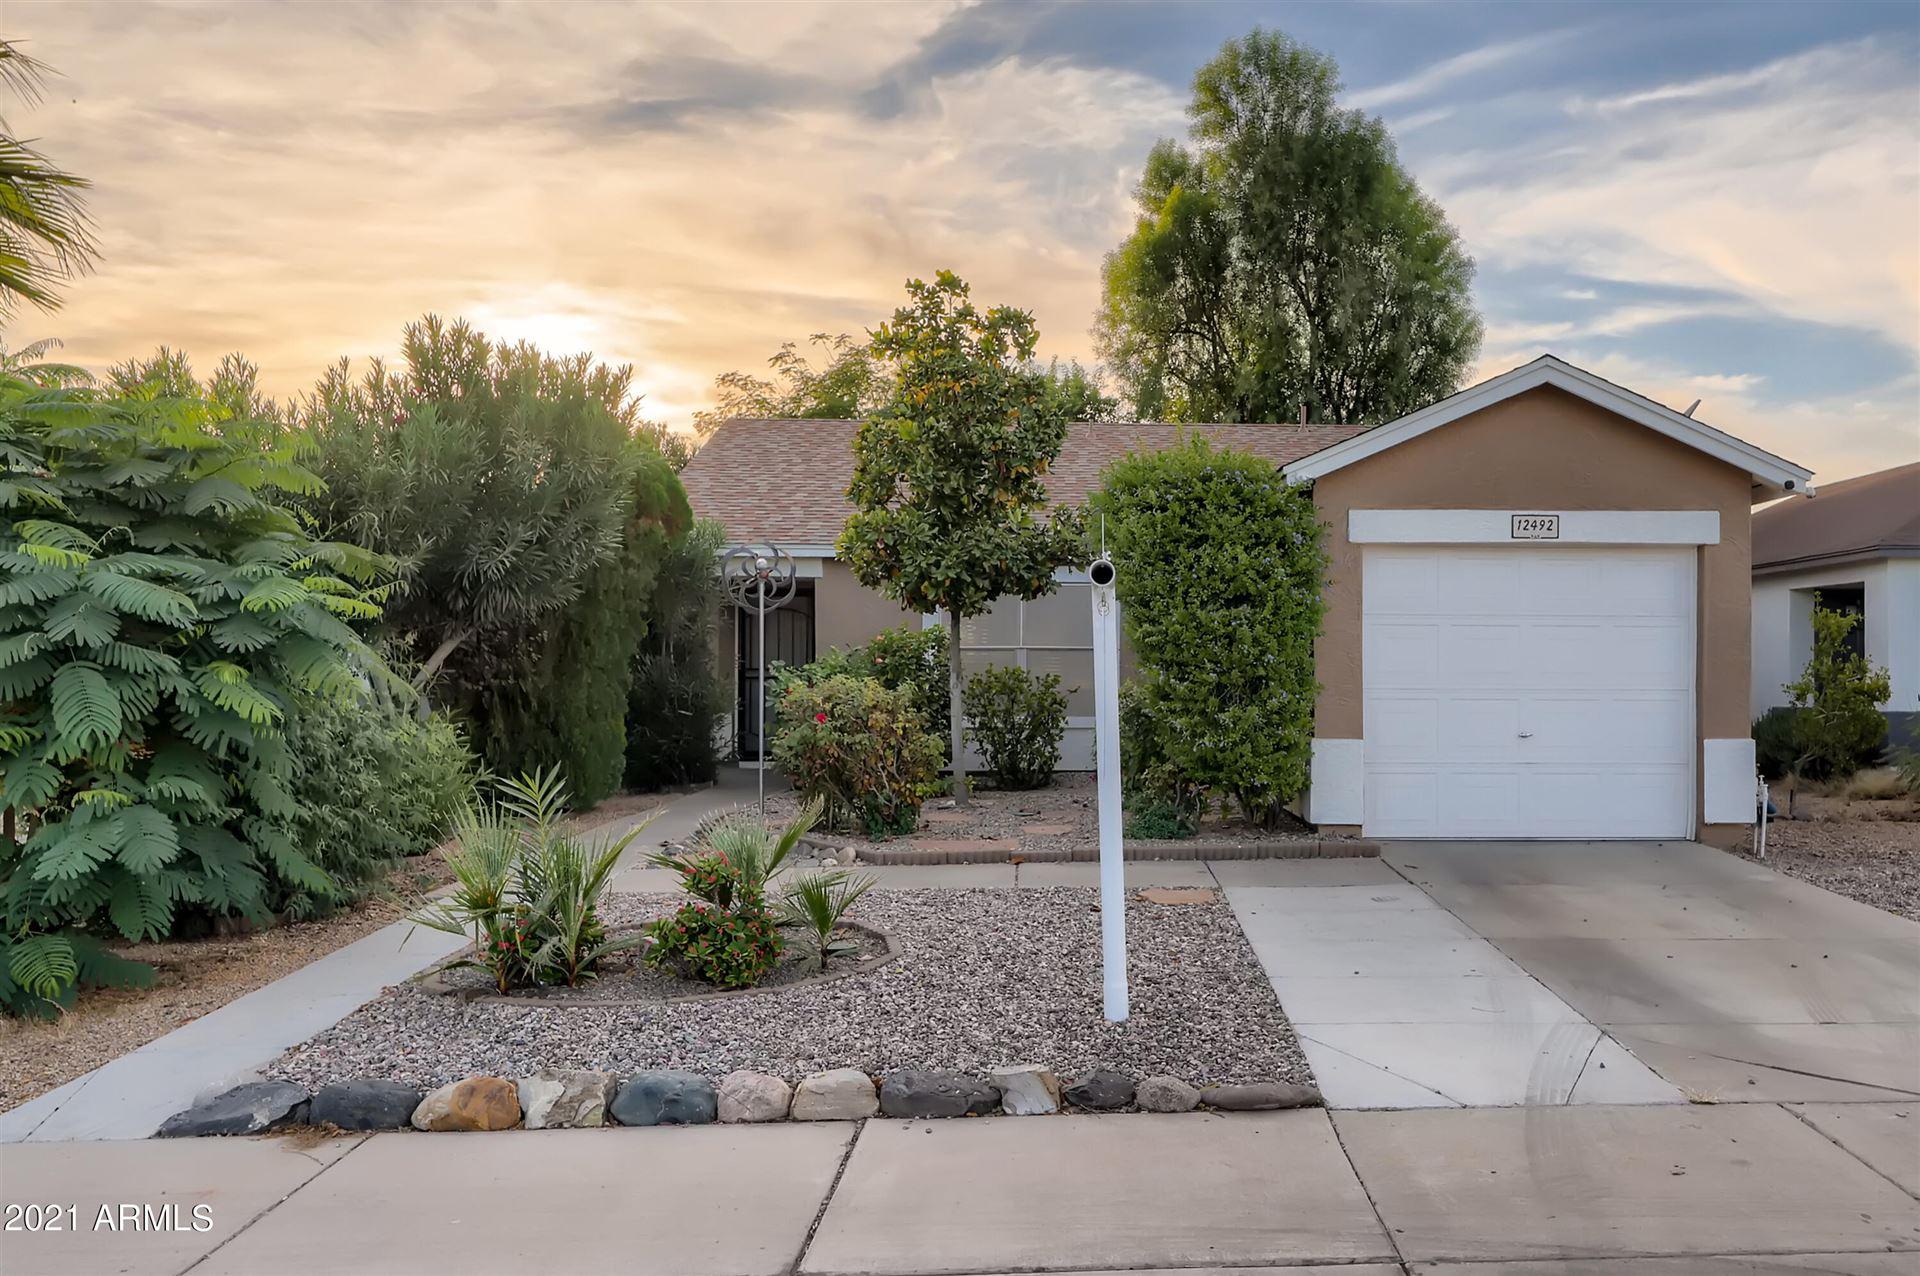 Photo of 12492 N B Street, El Mirage, AZ 85335 (MLS # 6307898)